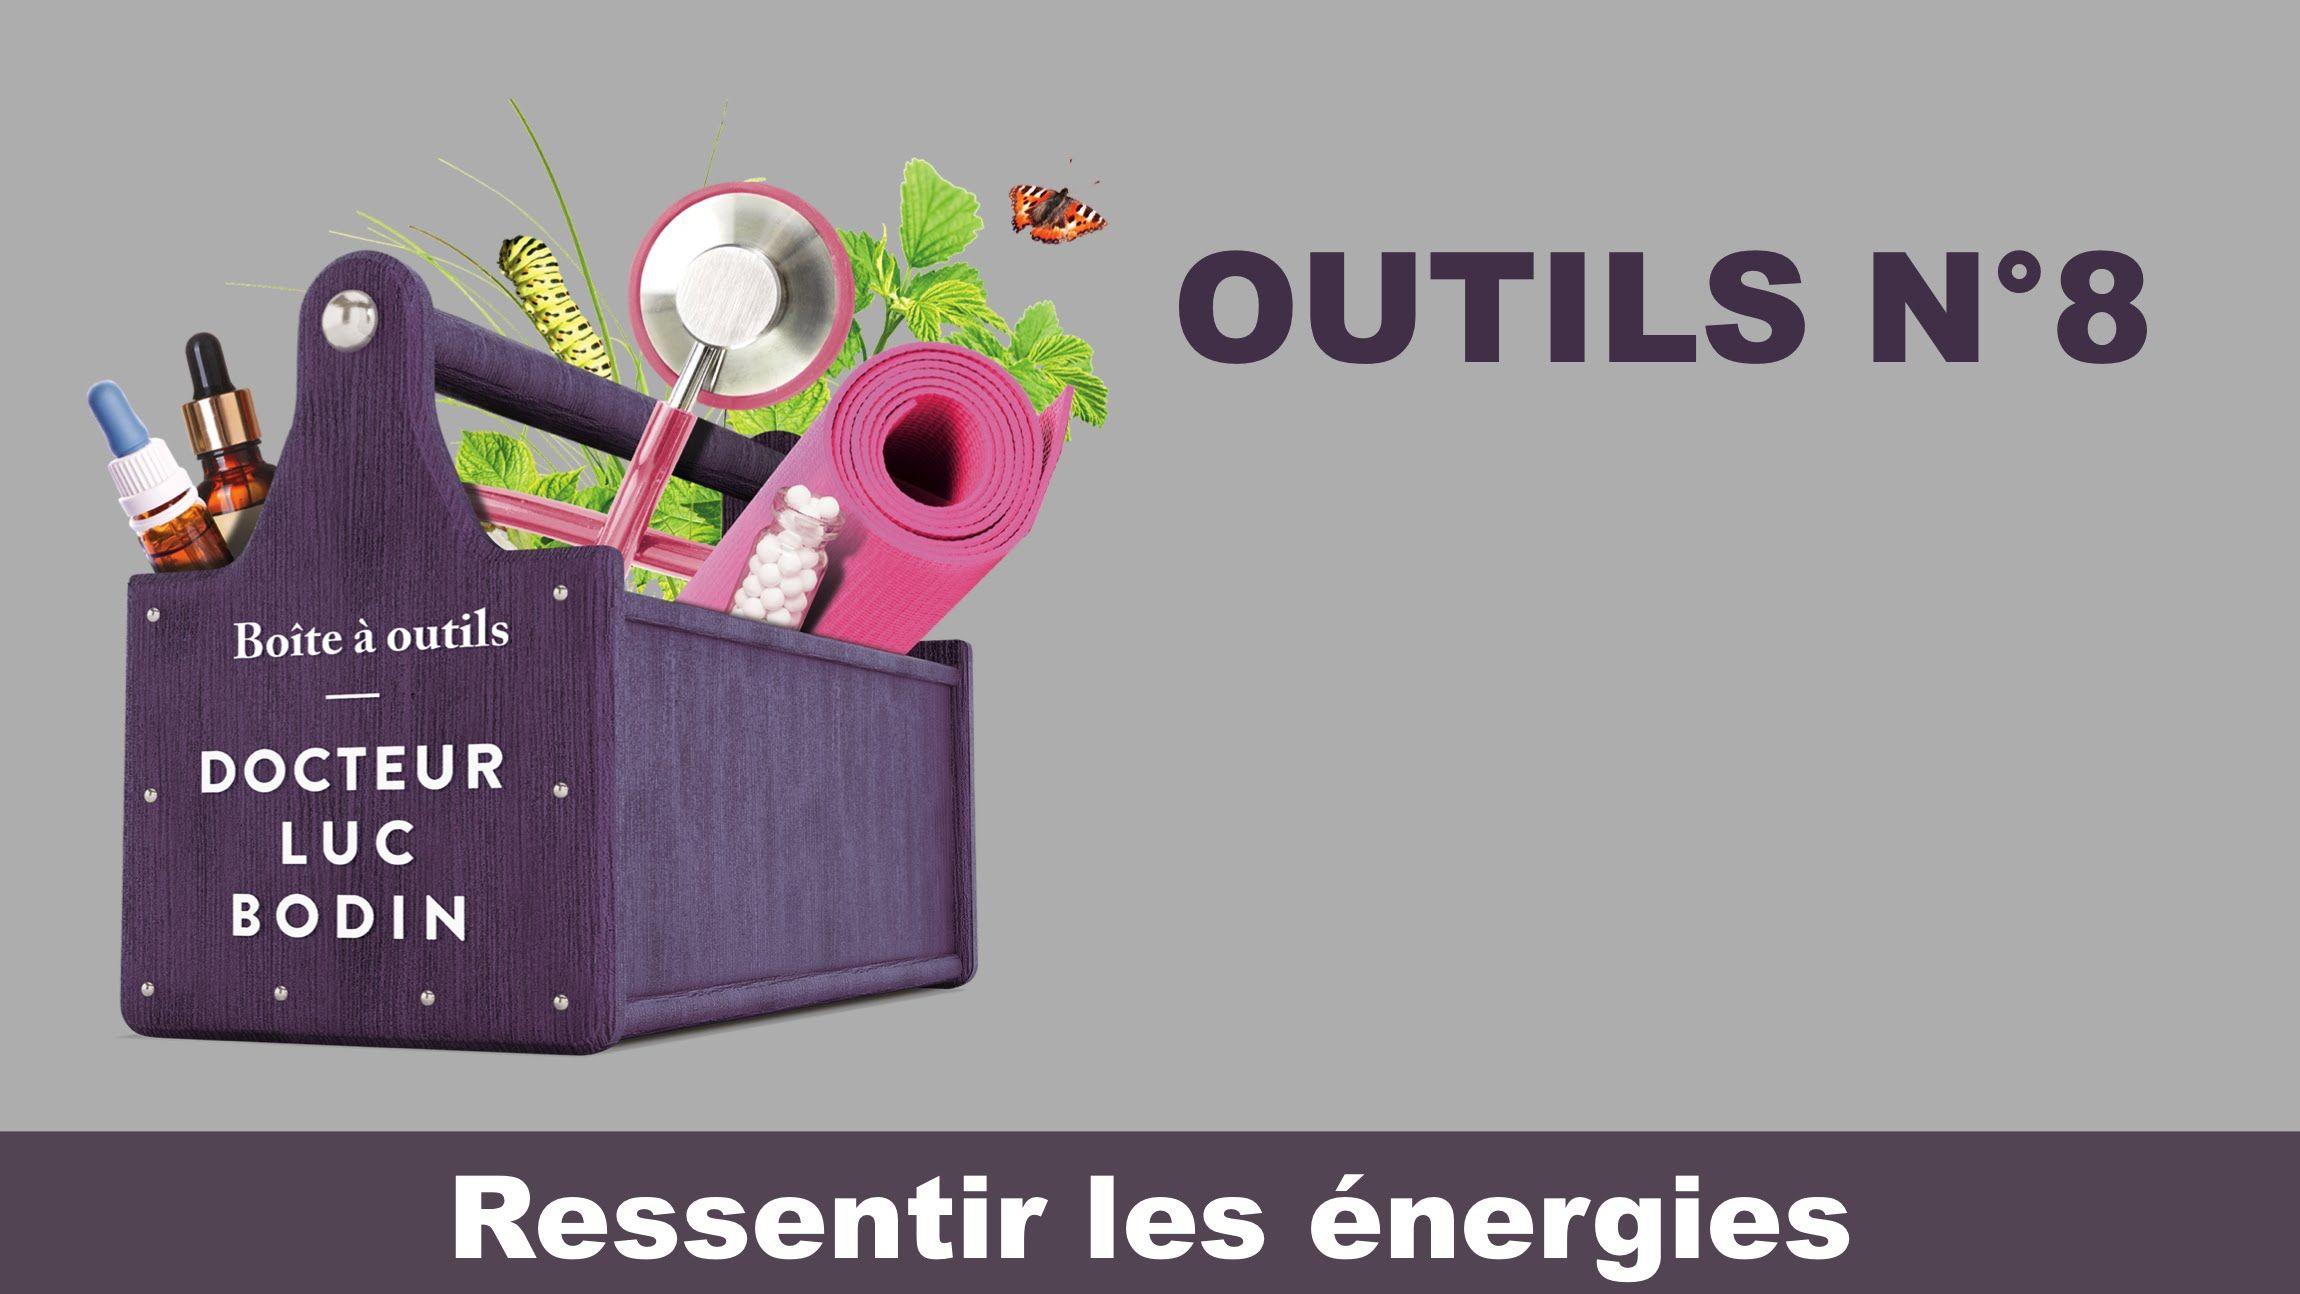 OUTIL N°8 : Ressentir les énergies